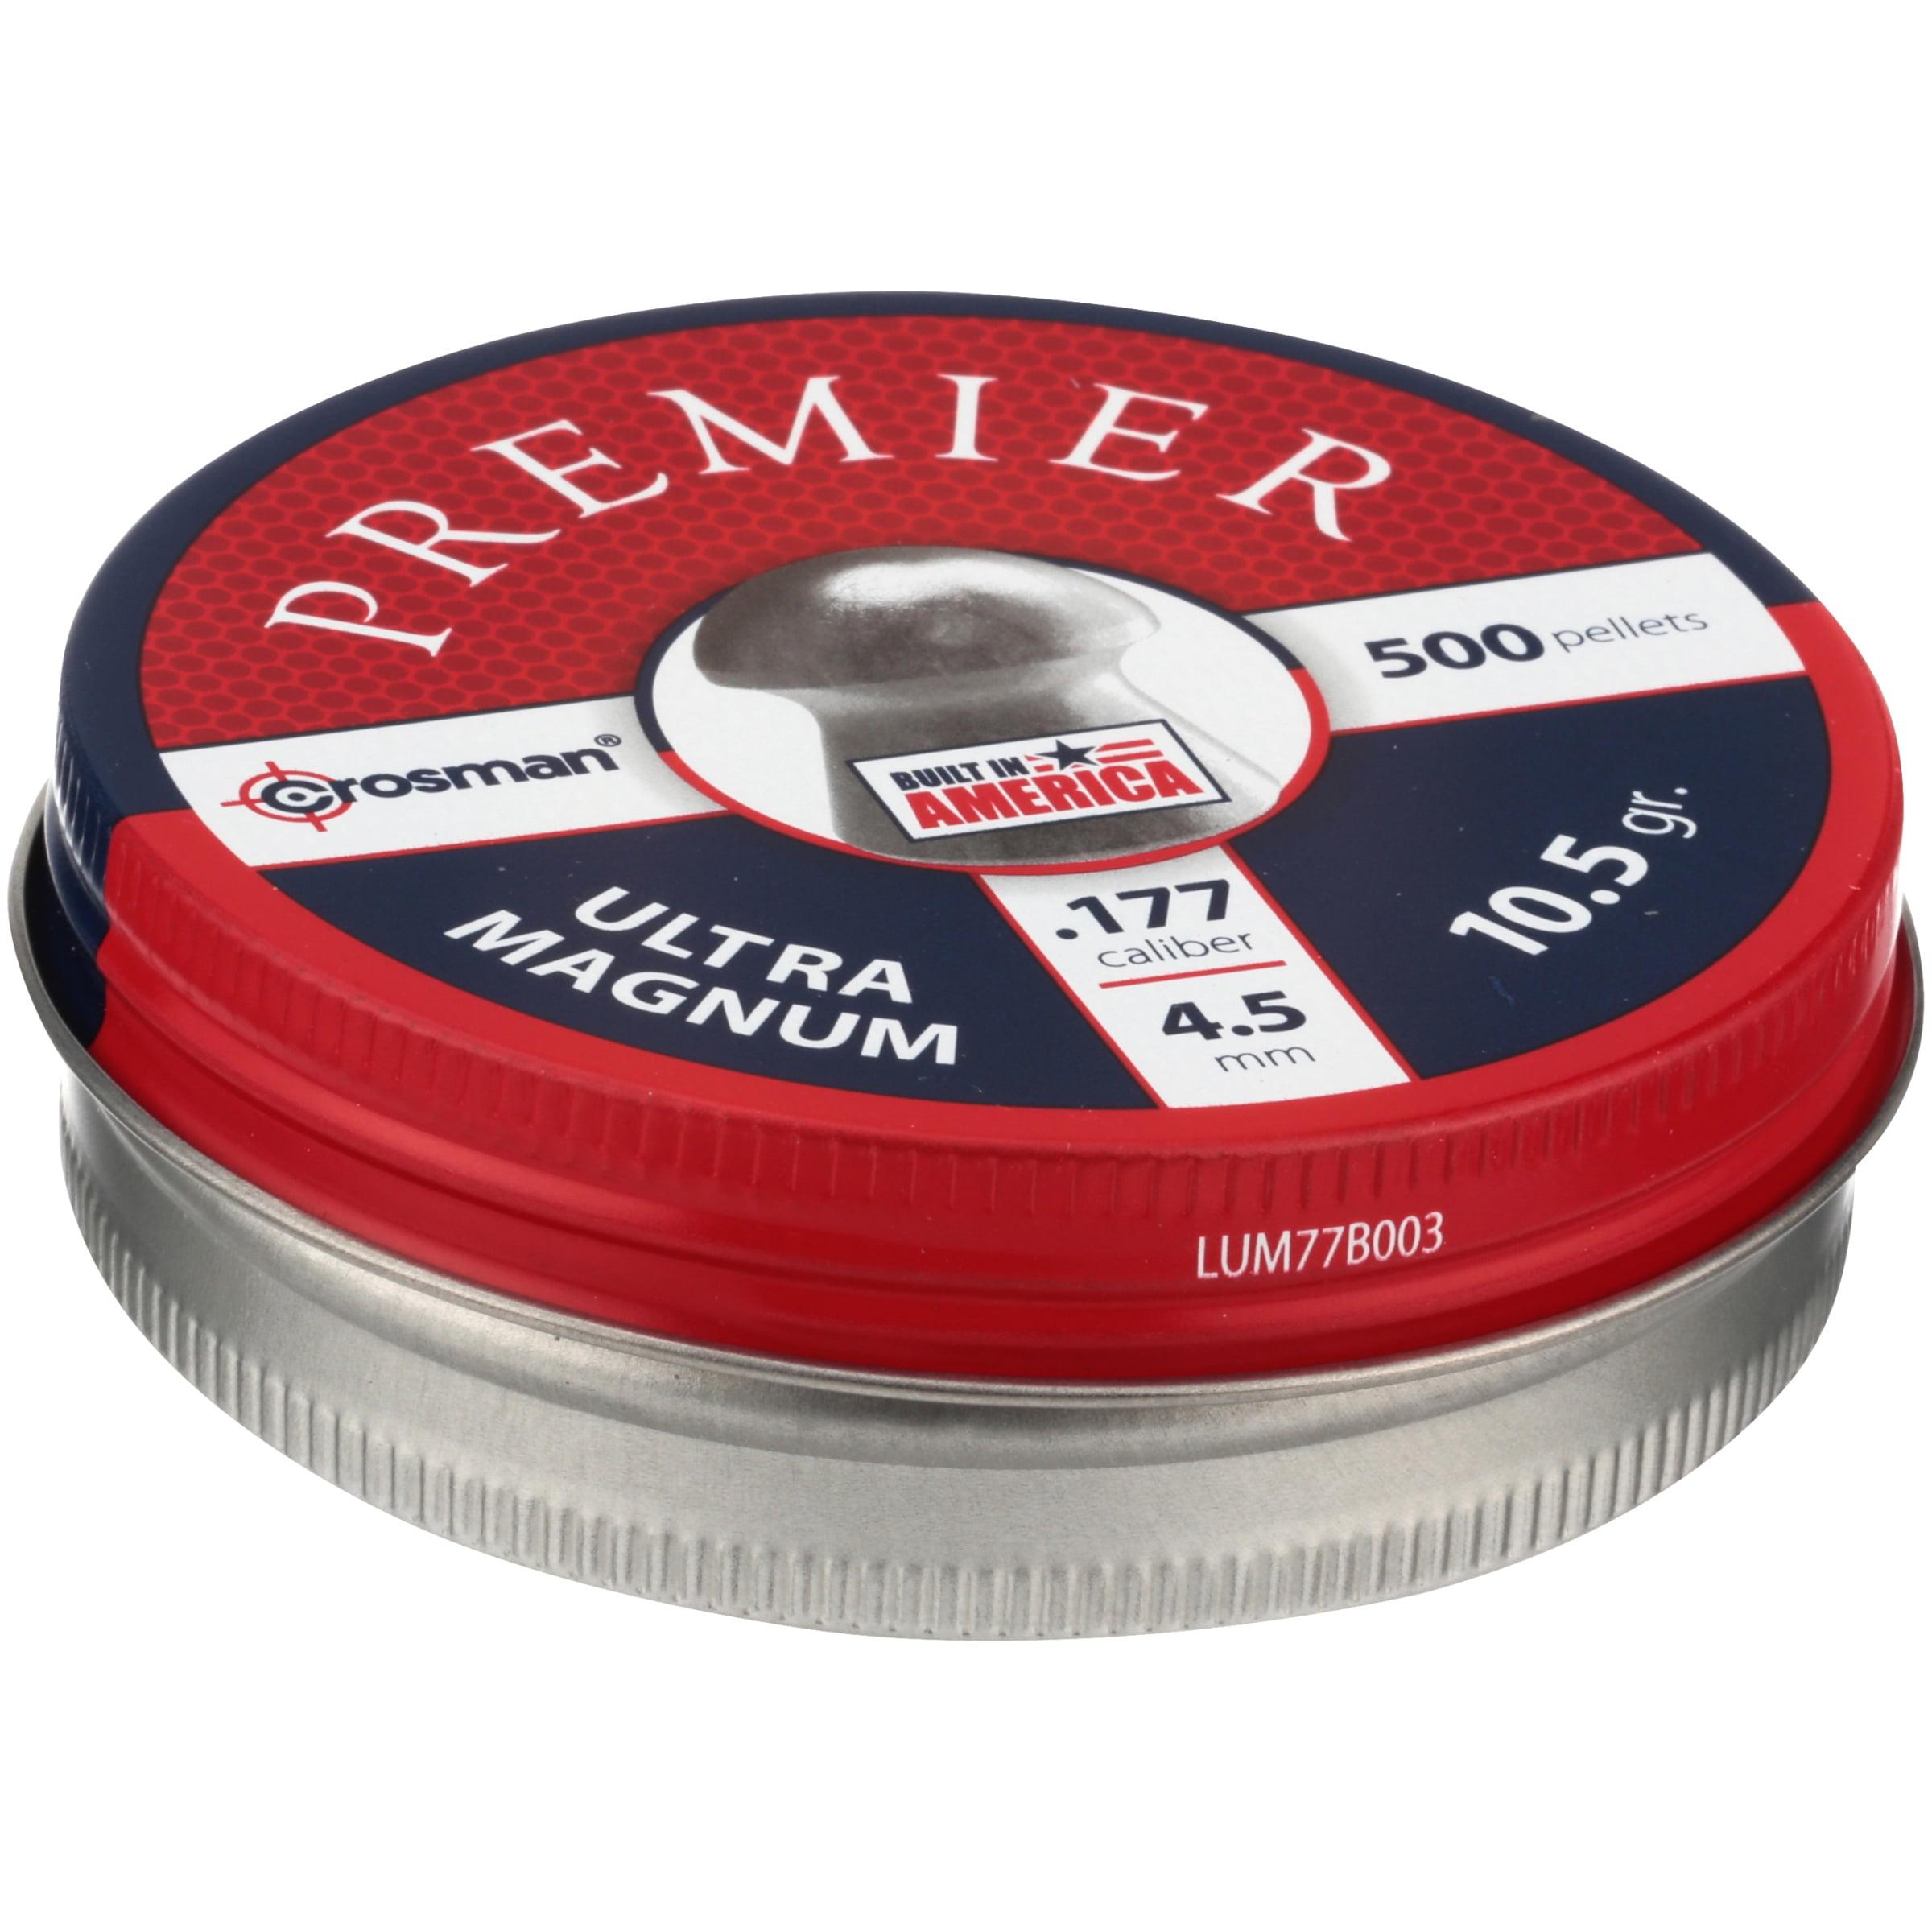 Crosman Premier Mag 177 Caliber Domed Pellets 500ct LUM77 by Crosman Corporation